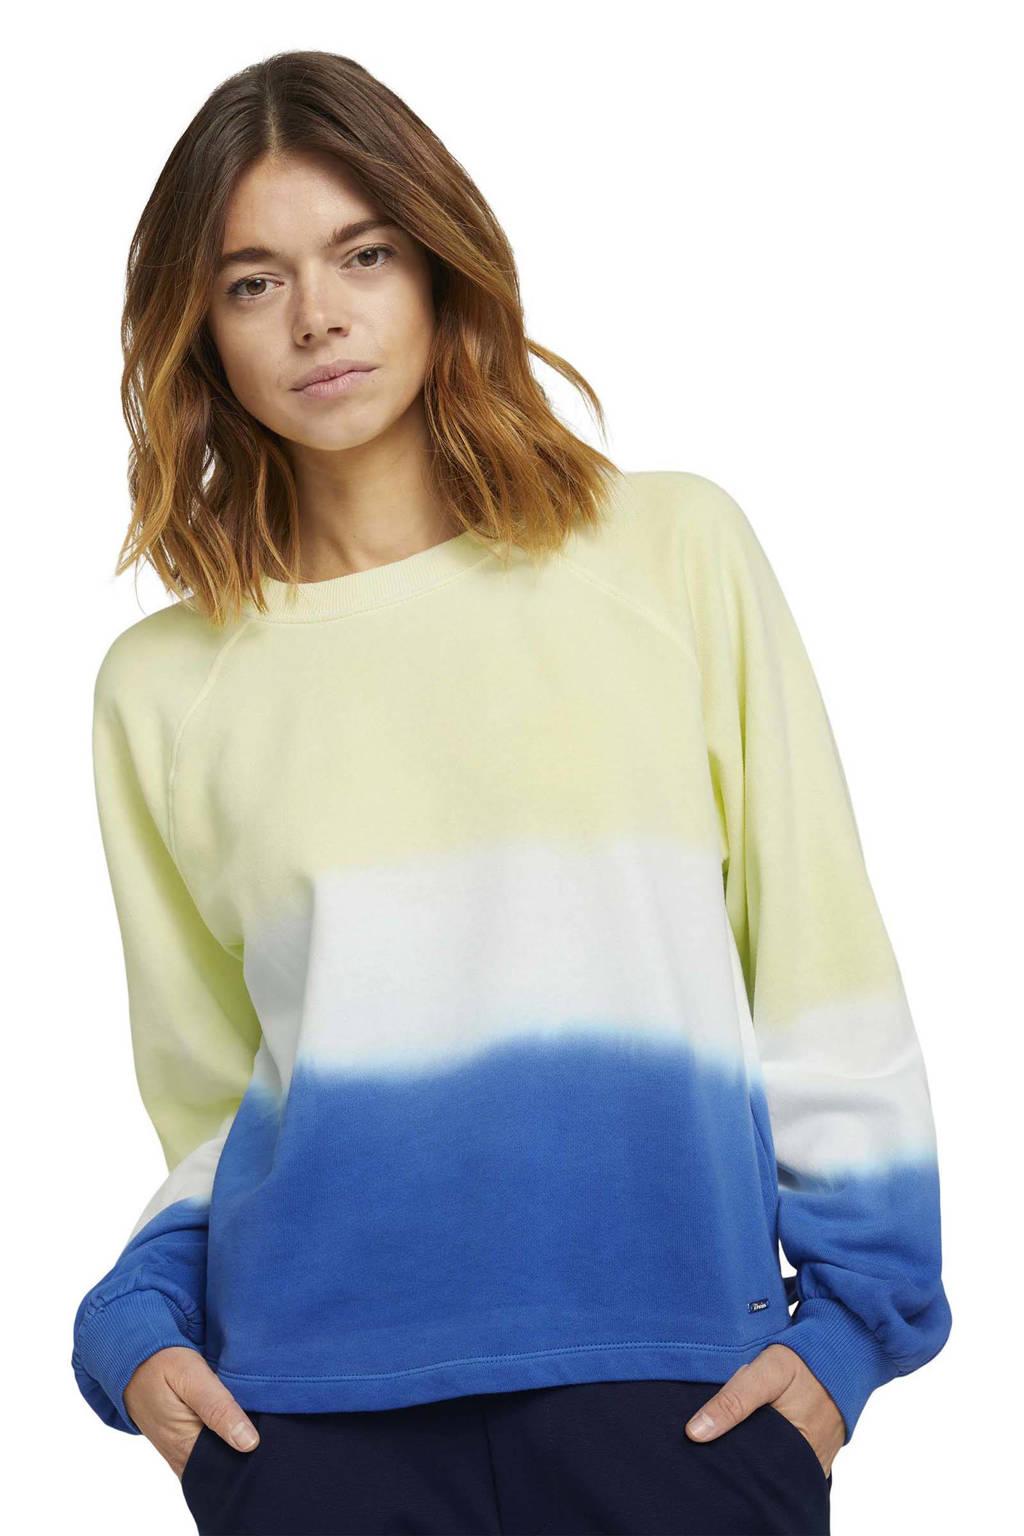 Tom Tailor Denim sweater geel/wit/blauw, Geel/wit/blauw